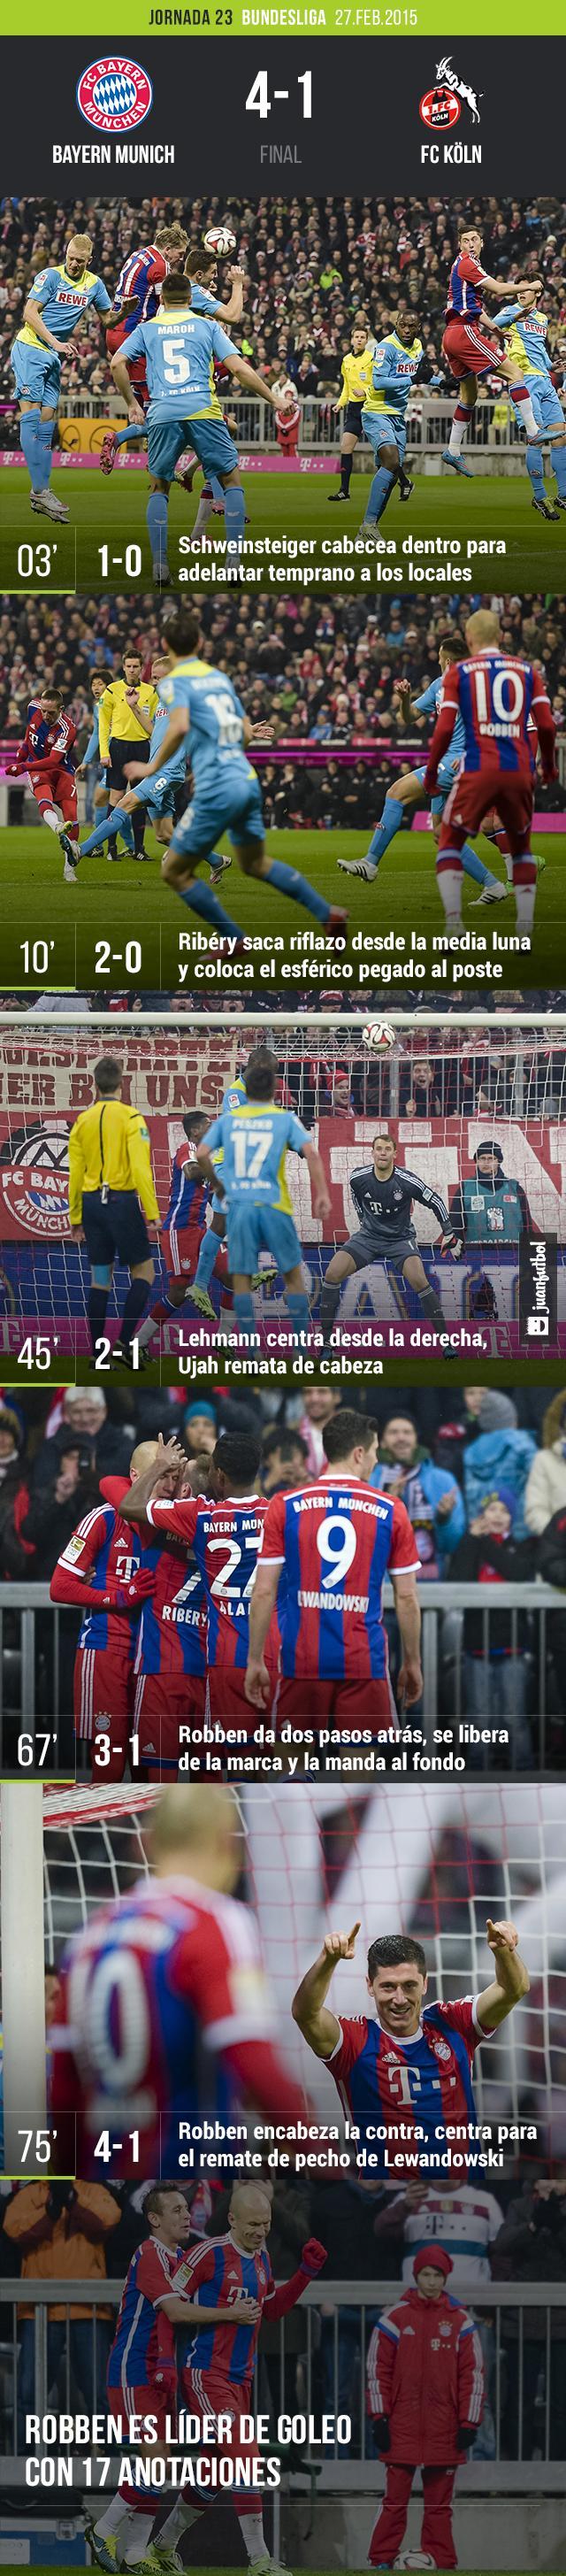 Bayern Munich vence 4-1 al Koln en la jornada 26 de la Bundesliga